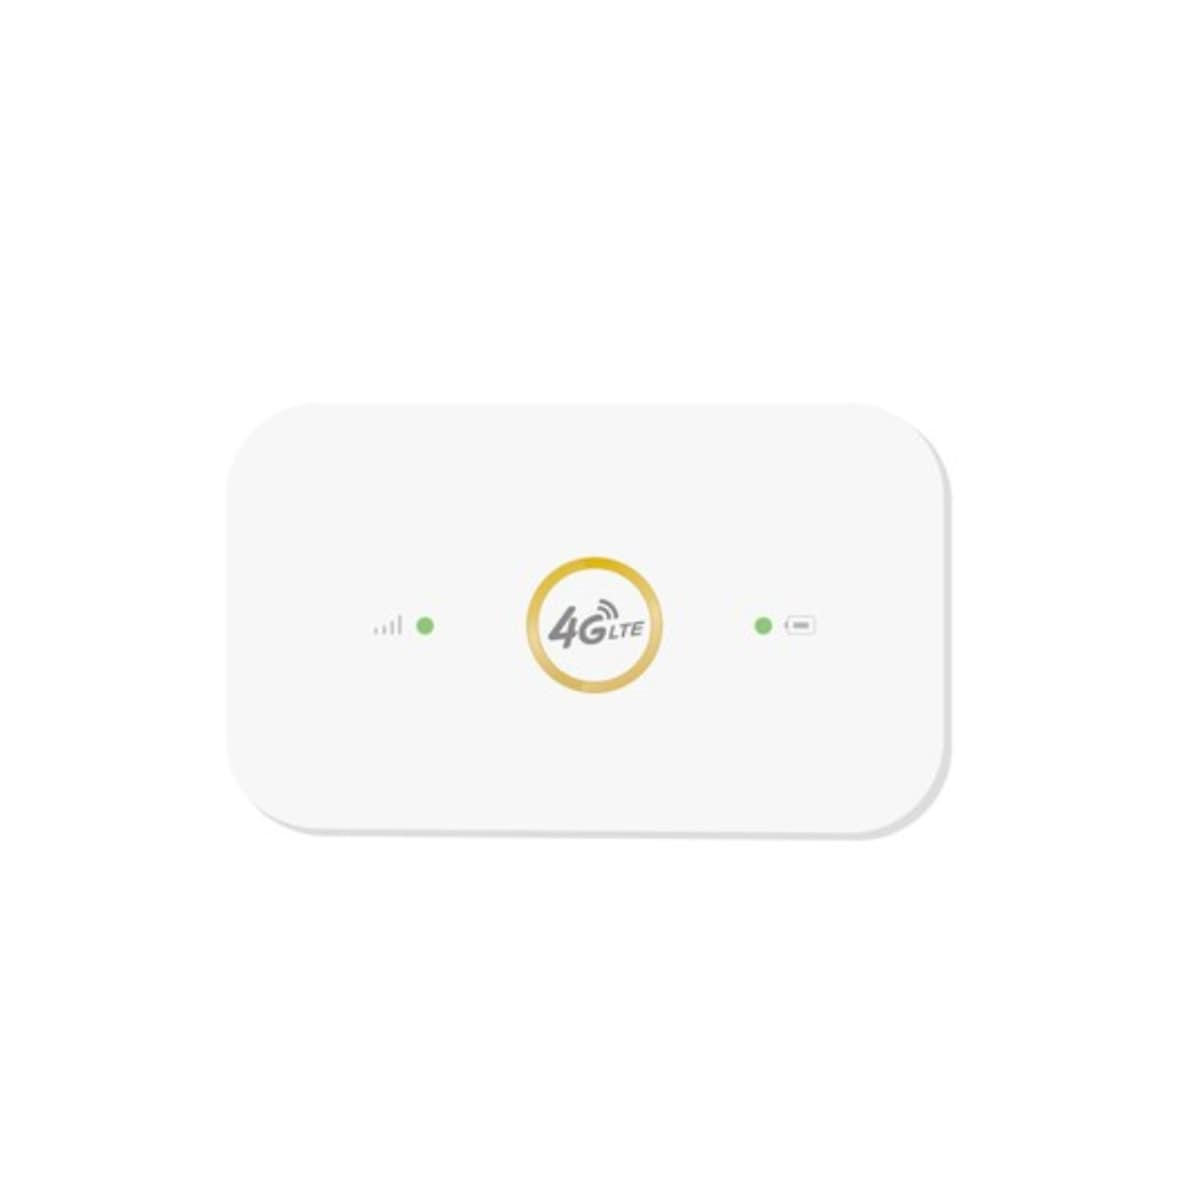 Router mobilny Alink M960 4G LTE 150Mbps SIM - 7